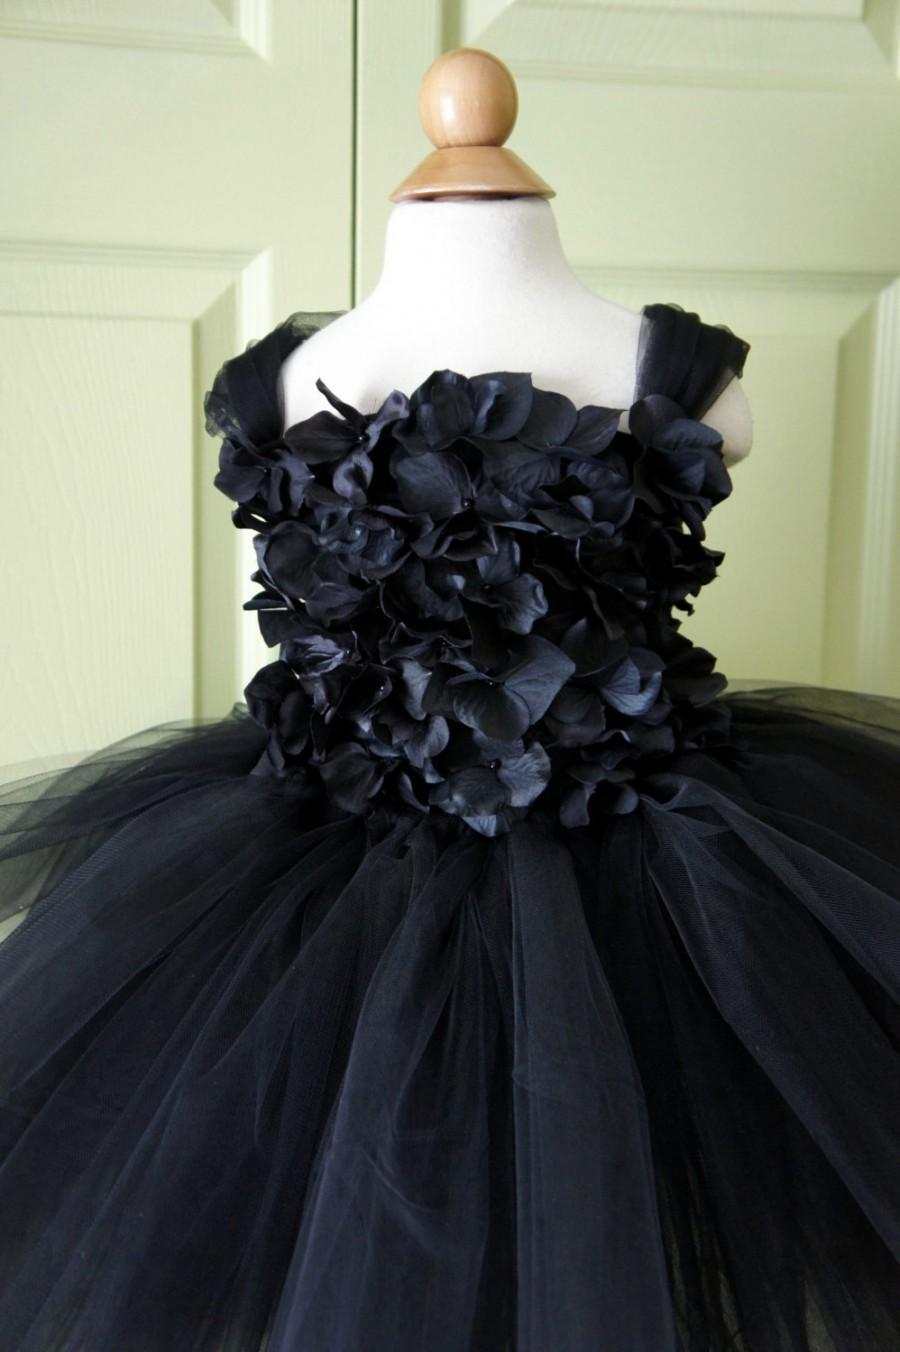 Wedding - Flower girl dress Black tutu dress, flower top, baby tutu dress, toddler tutu dress